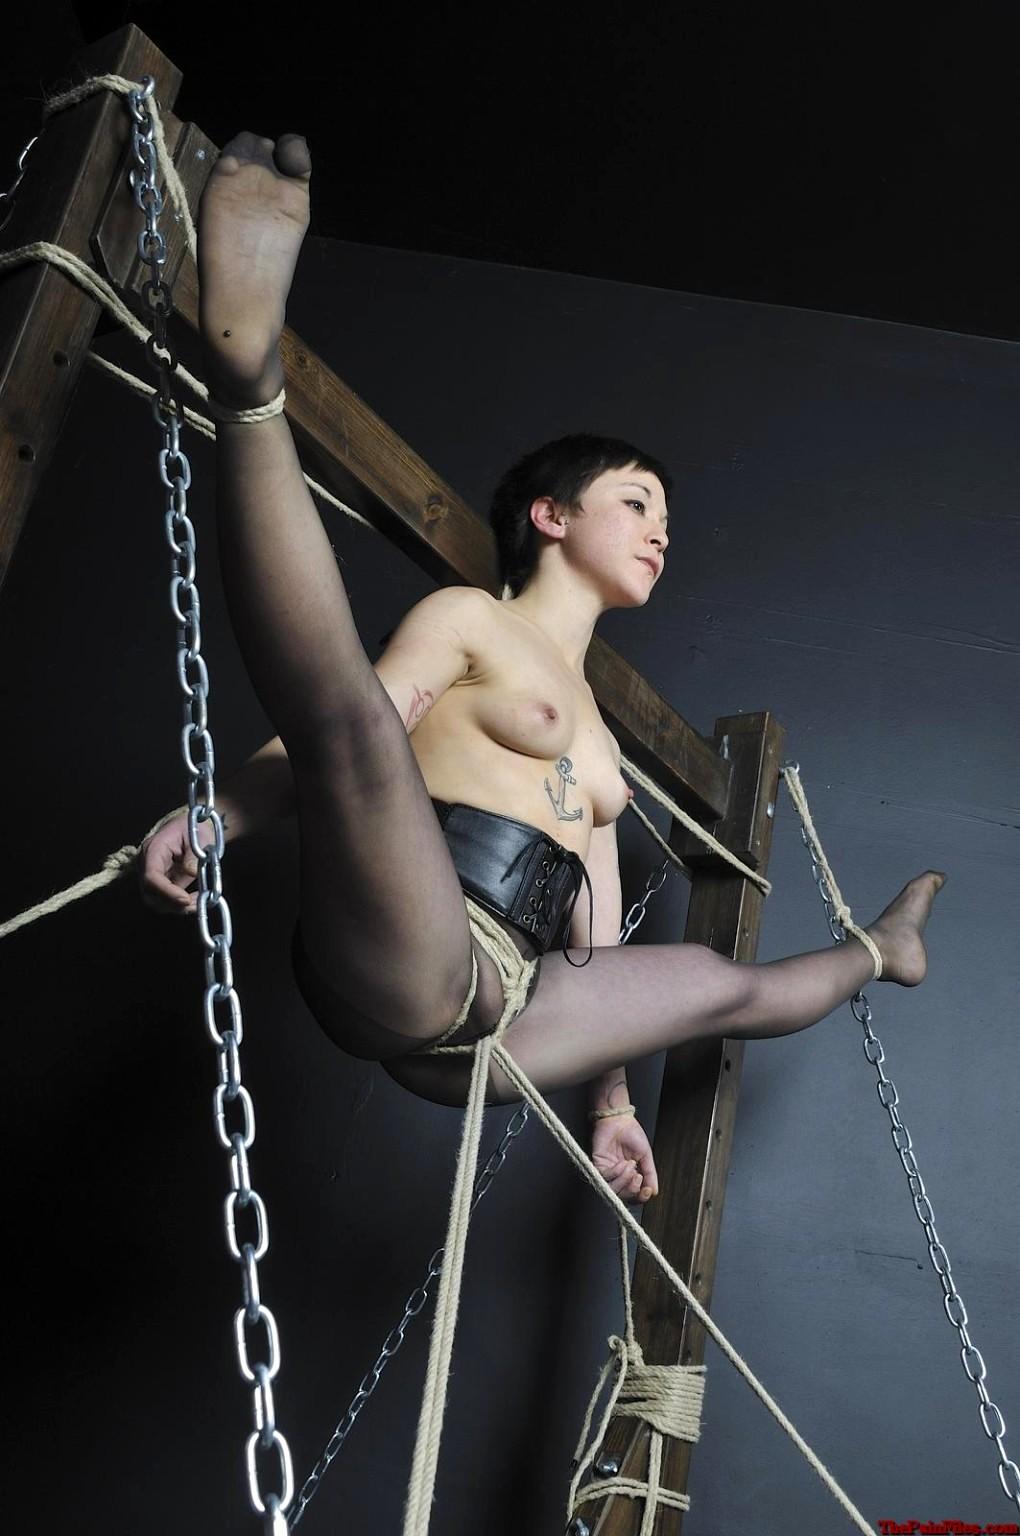 Bondage Hanging Upside Down